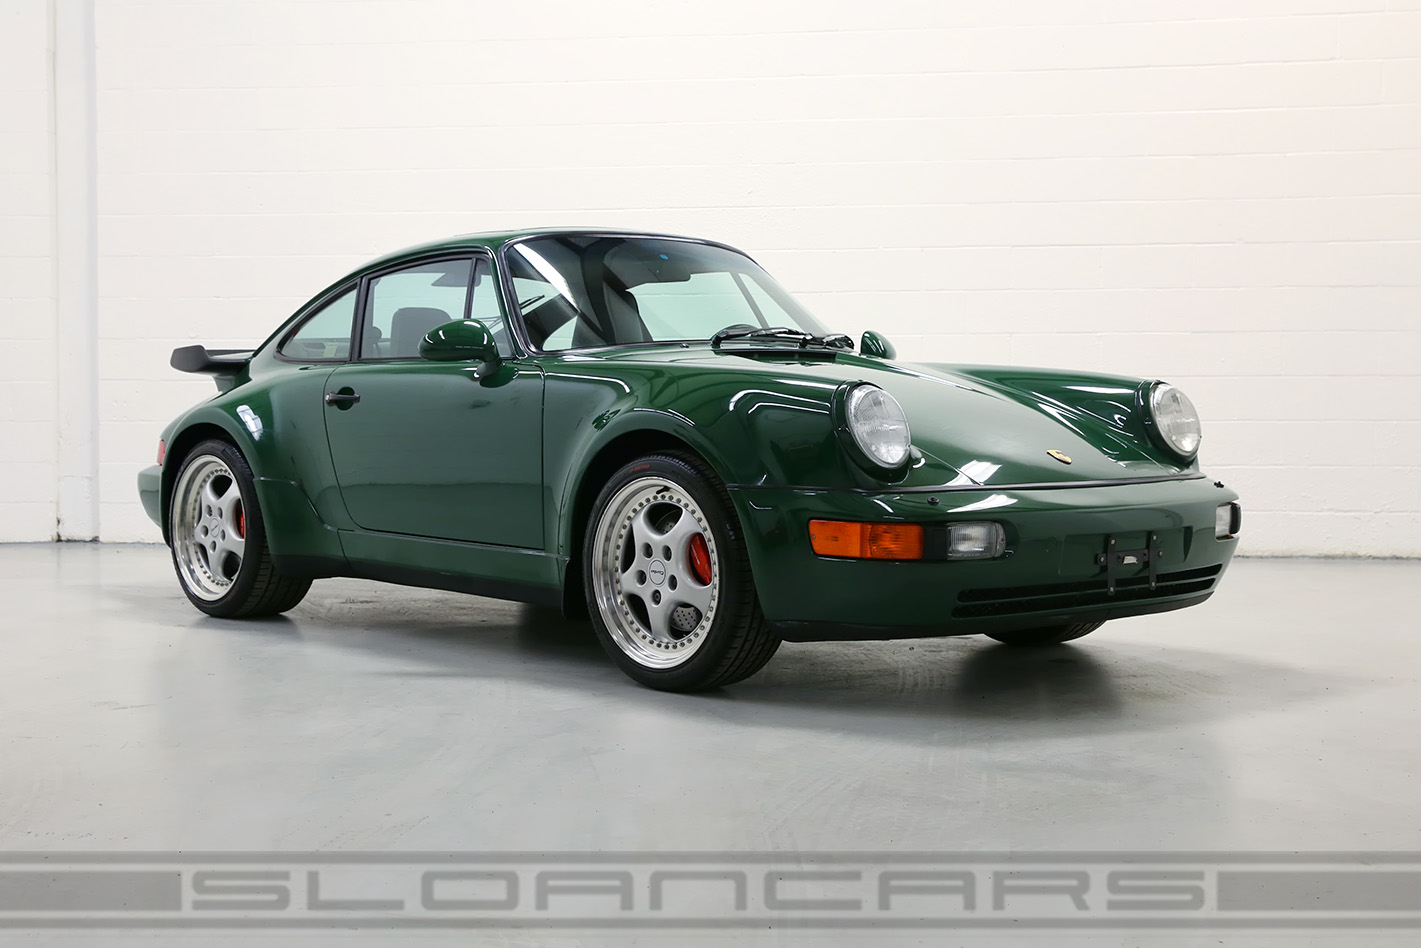 1994 Porsche 964 3.6 Turbo Paint-to-Sample Irish Green